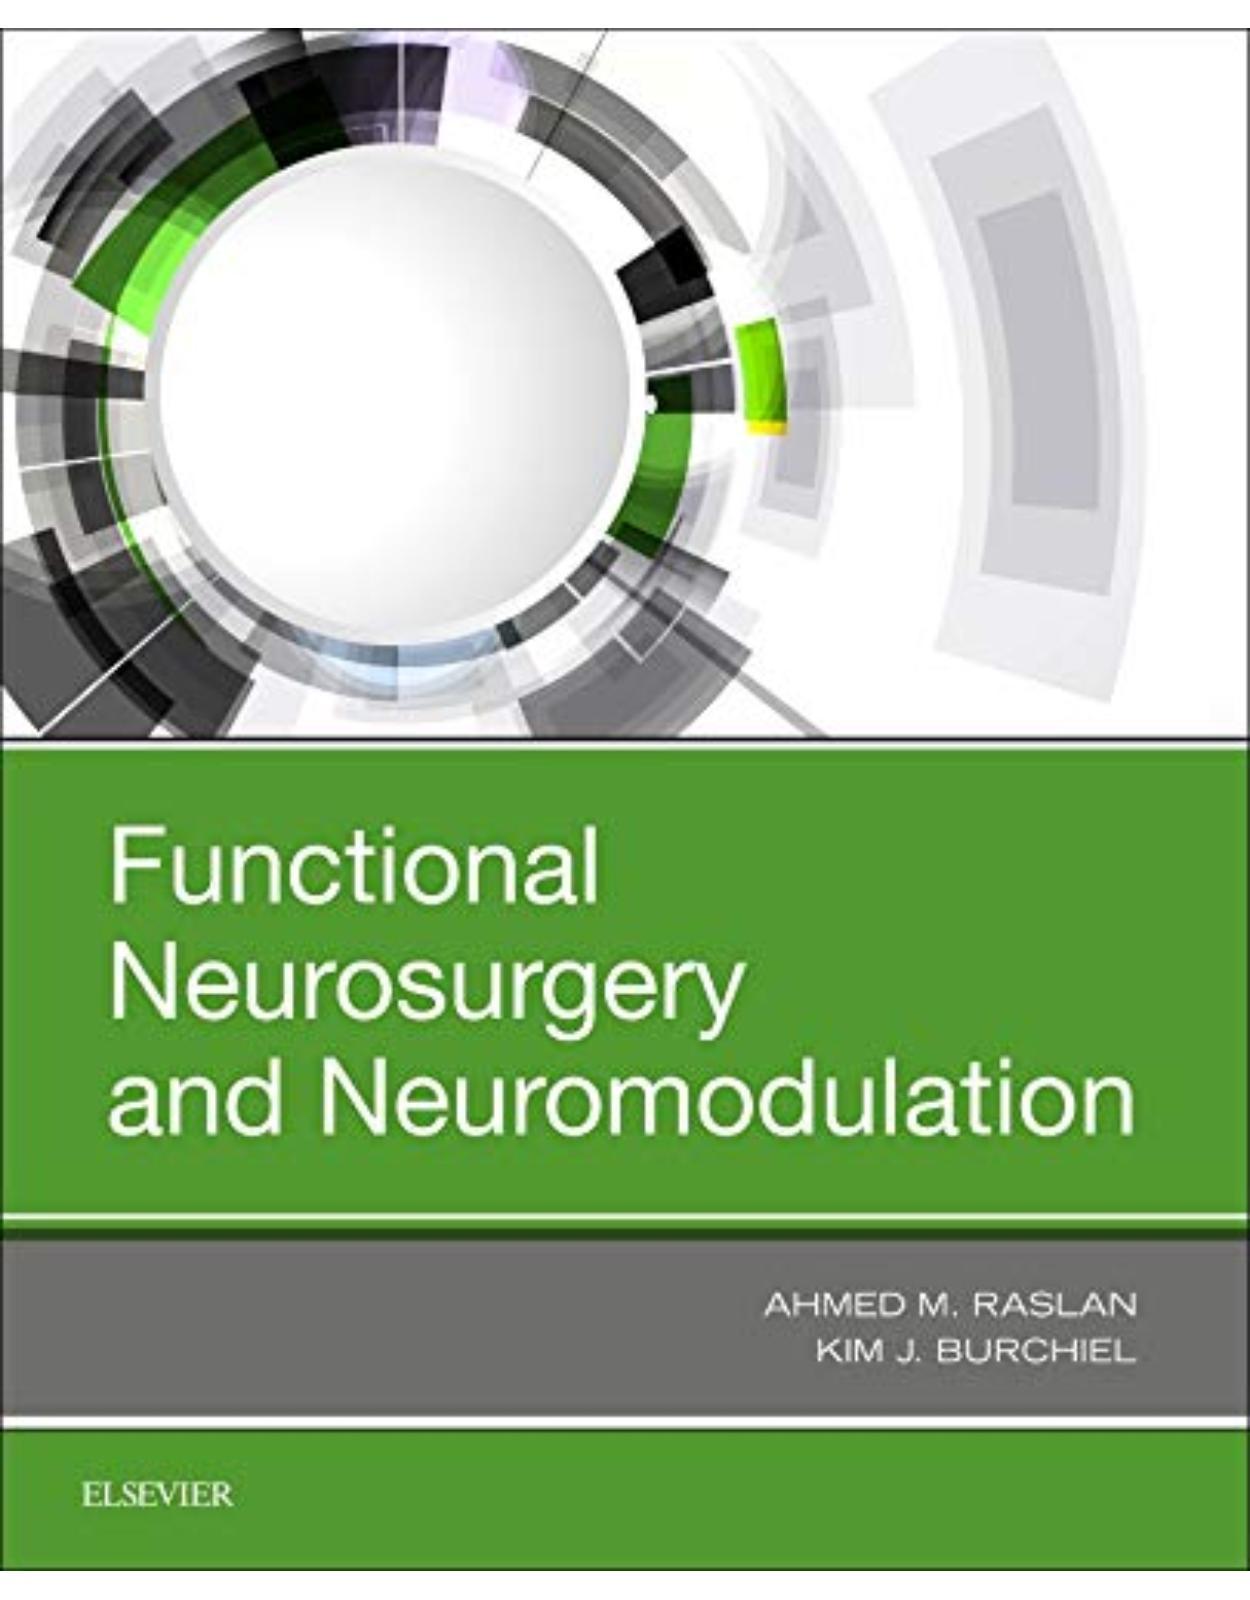 Functional Neurosurgery and Neuromodulation